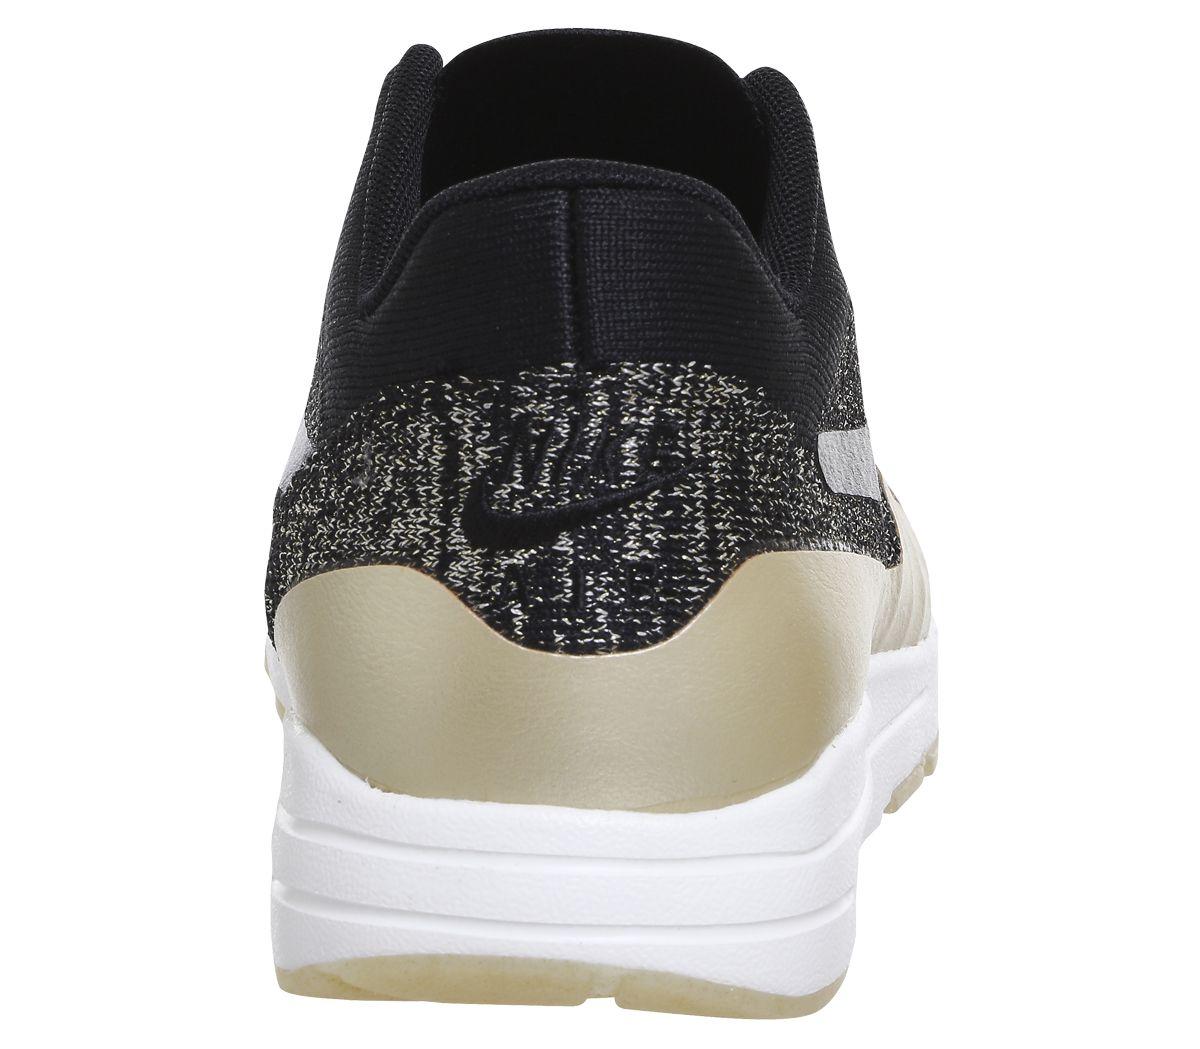 b978250e2d Nike Air Max 1 Ultra 2.0 Flyknit Black Black Metallic Gold Star ...